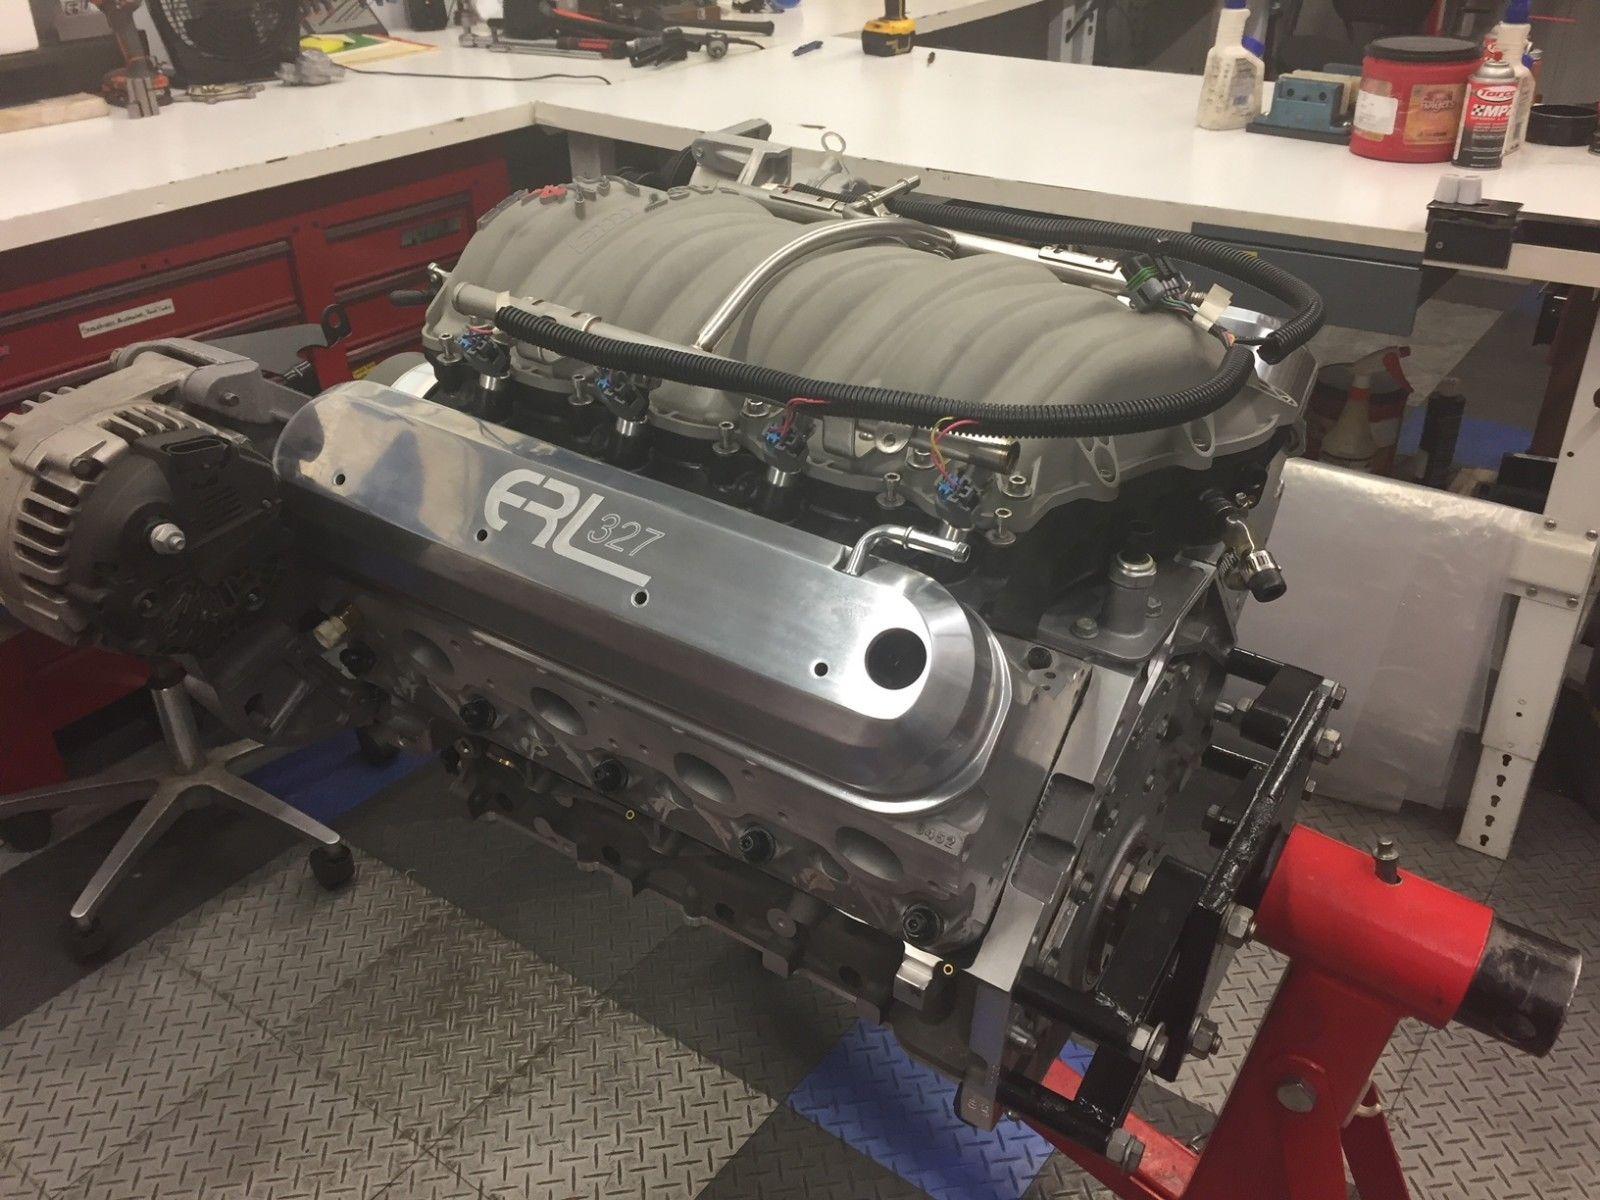 2006 Chevrolet Corvette flat-plane-crank engine